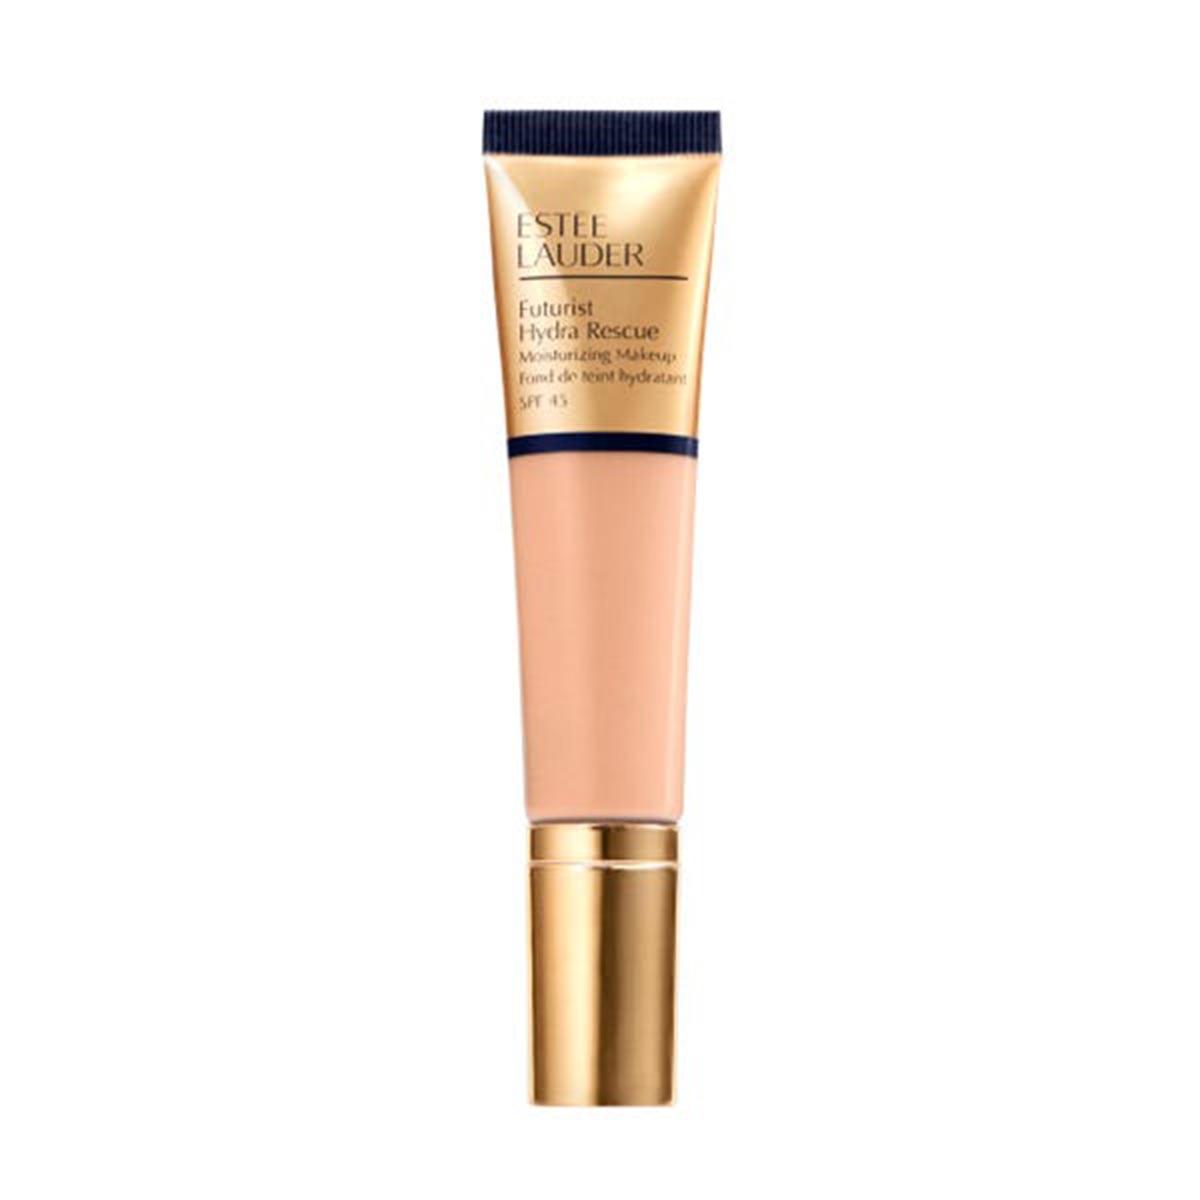 Estee lauder futurist hydra rescue mosturizing makeup spf45 3n1 ivory beige - BellezaMagica.com